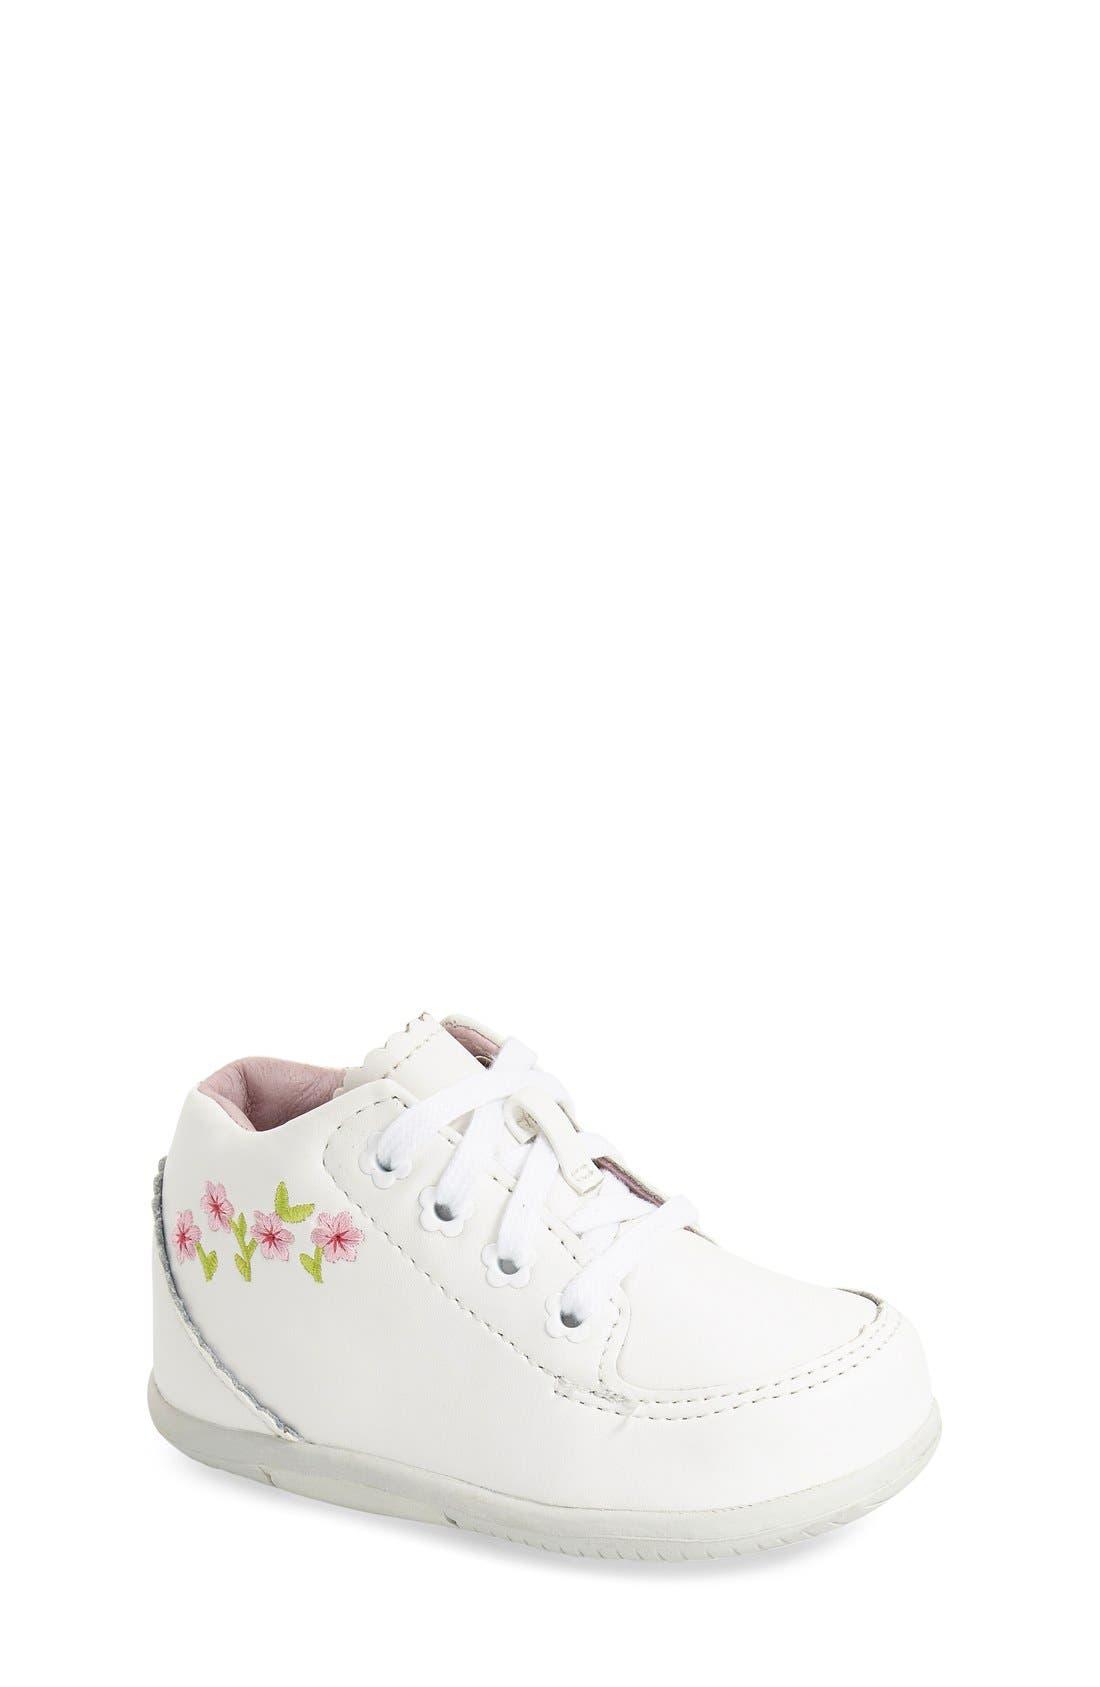 Stride Rite 'Emilia' Leather Boot (Baby & Walker)